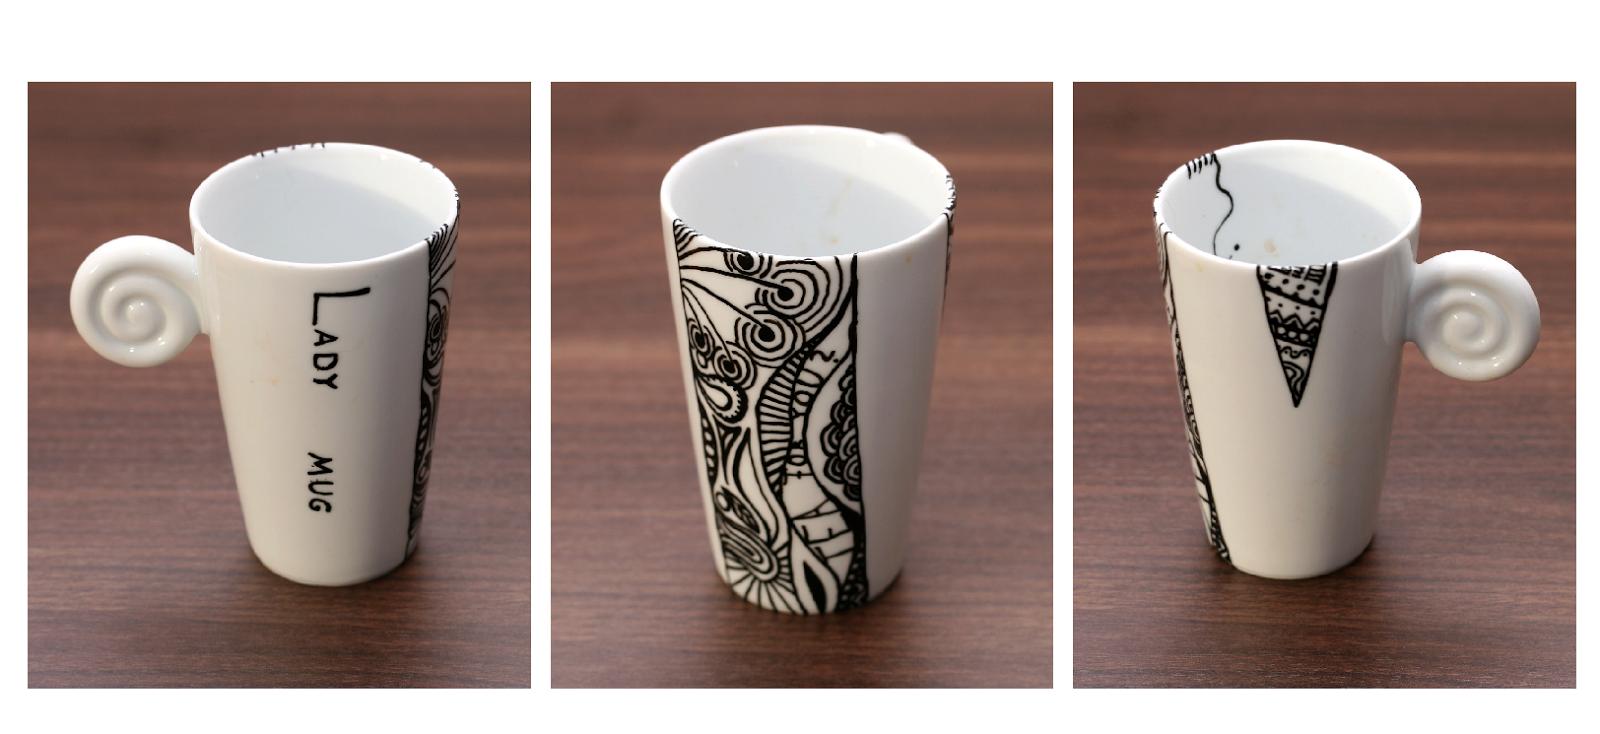 doodled distraction avp tassen schwarz wei. Black Bedroom Furniture Sets. Home Design Ideas